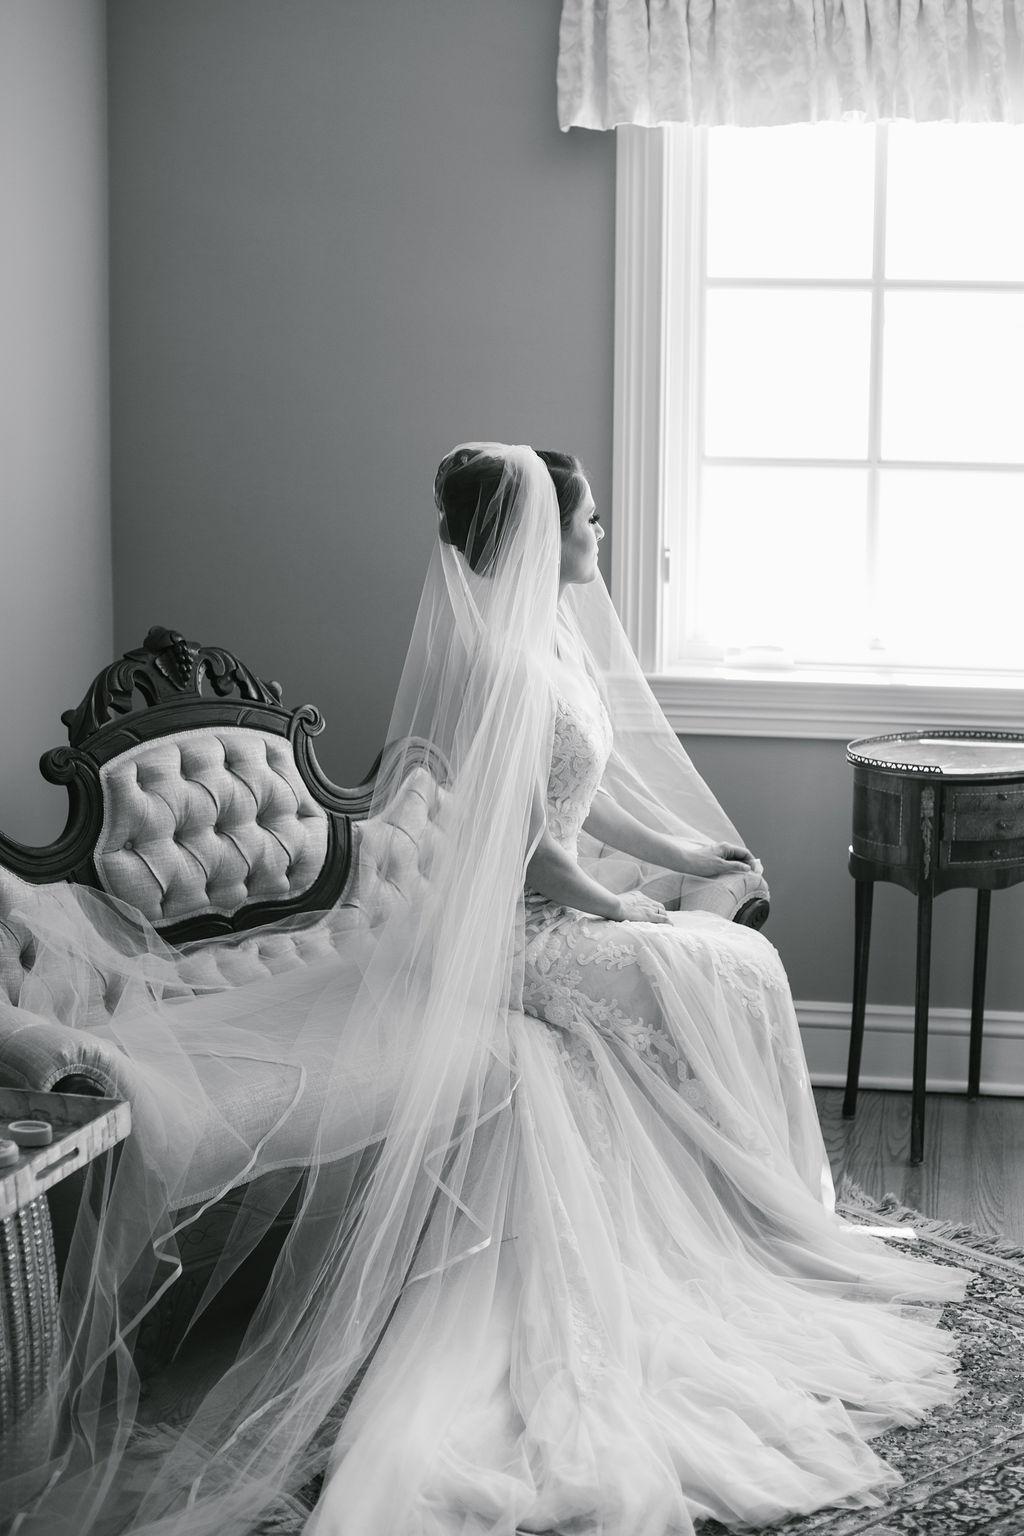 Romantic Tampa Bay Bride Beauty Wedding Portrait Wearing Full Length Veil